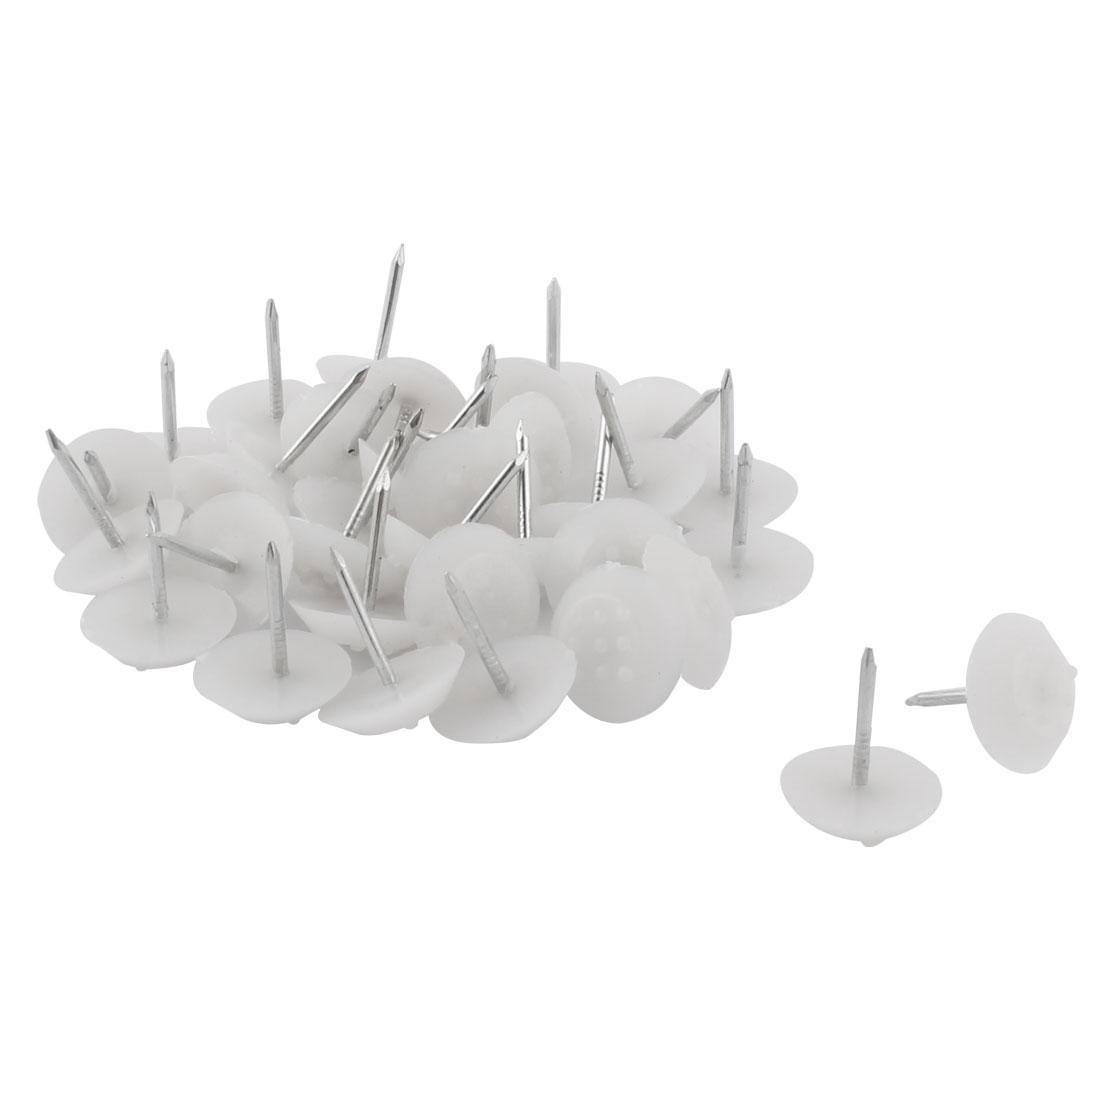 Furniture Chair Plastic Leg Feet Protector Non-slip Nails White 1.4cm Dia 30pcs